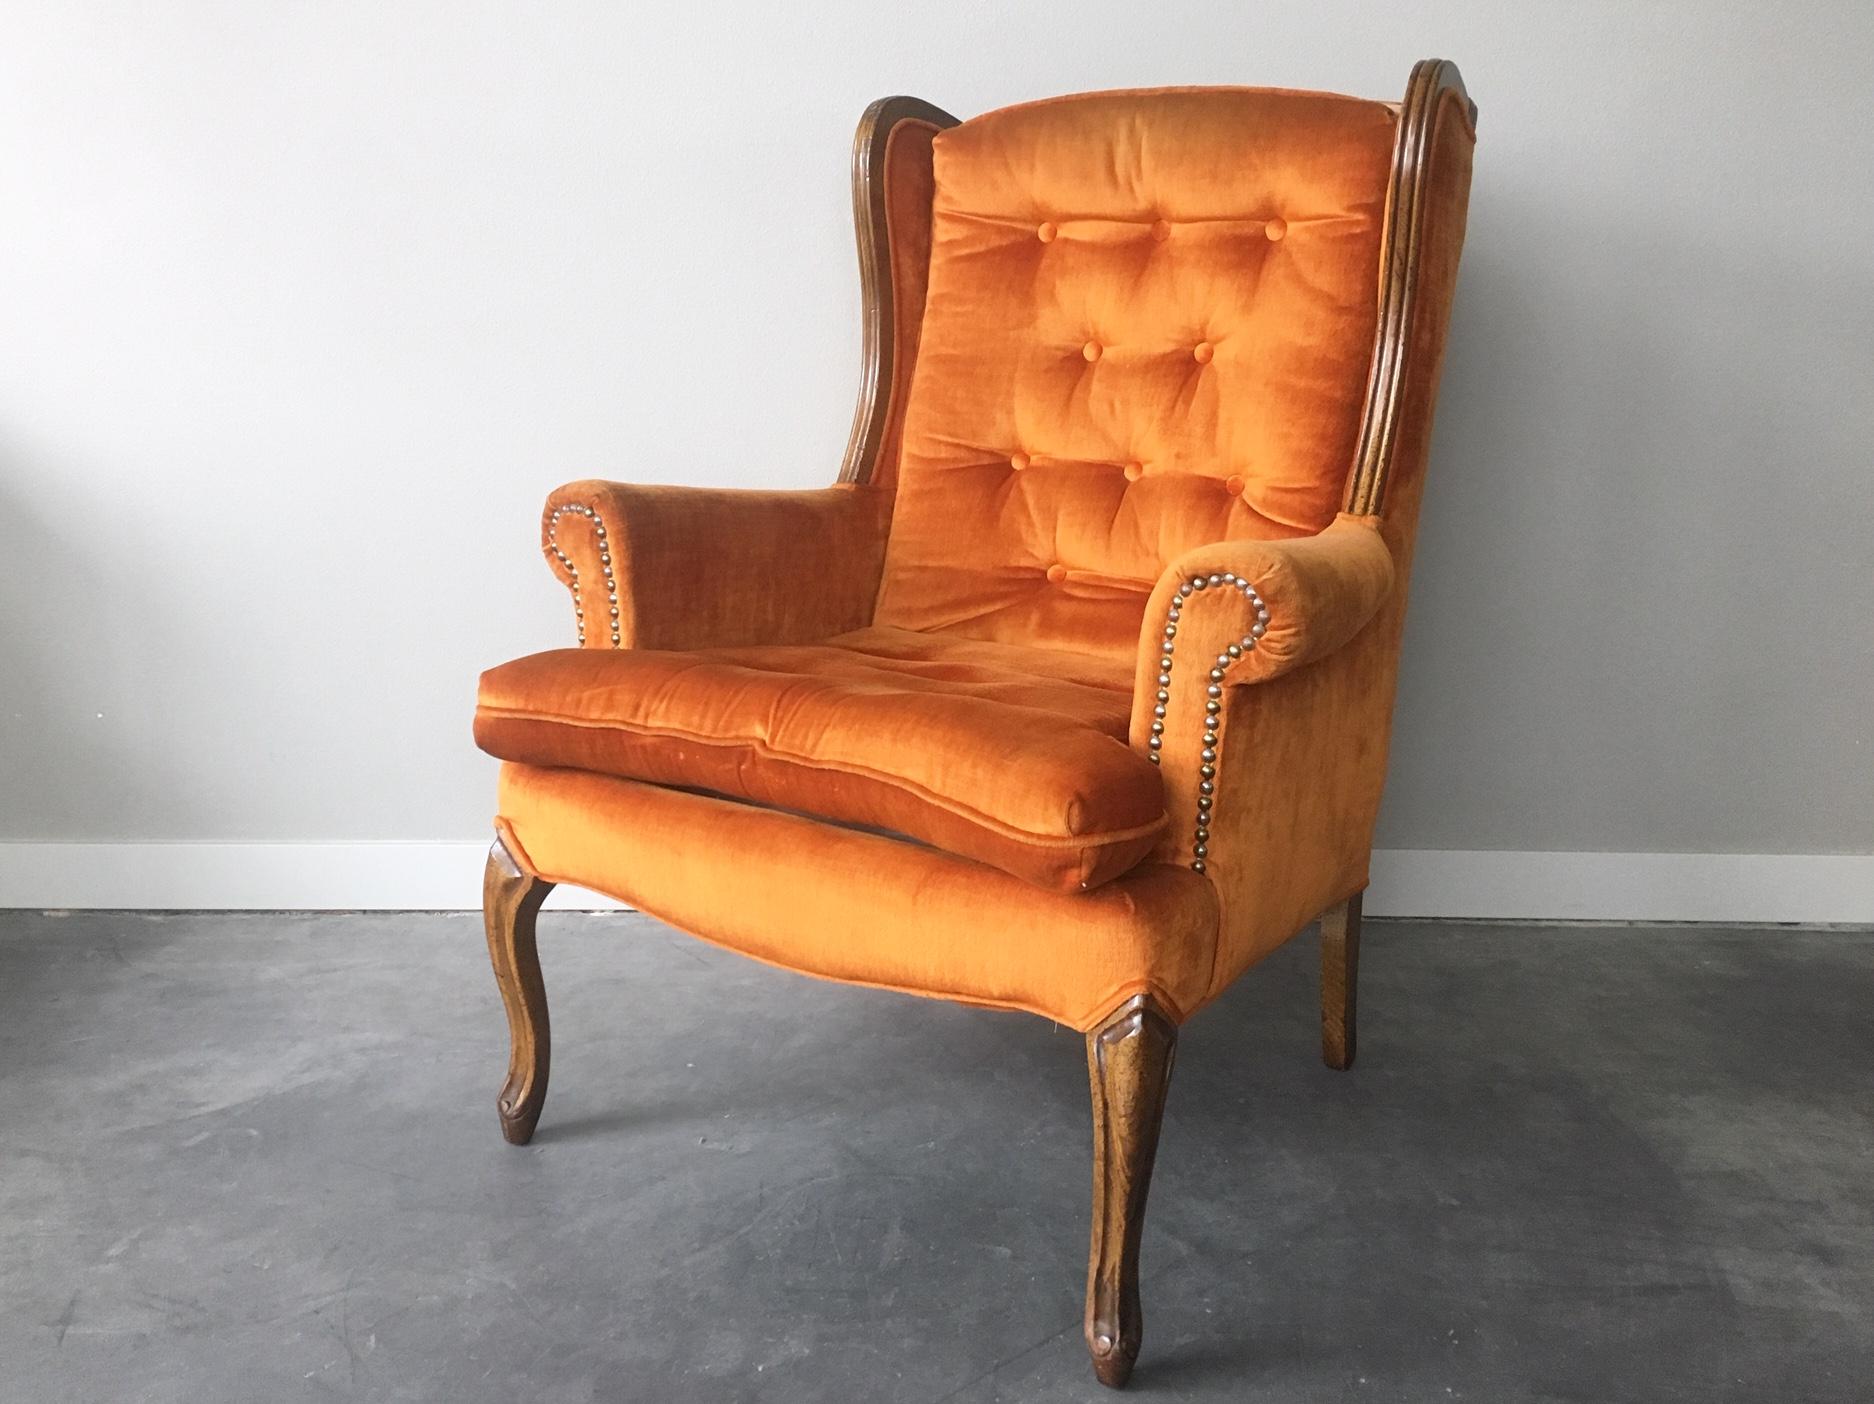 Rerunroom vintage furniture home decor